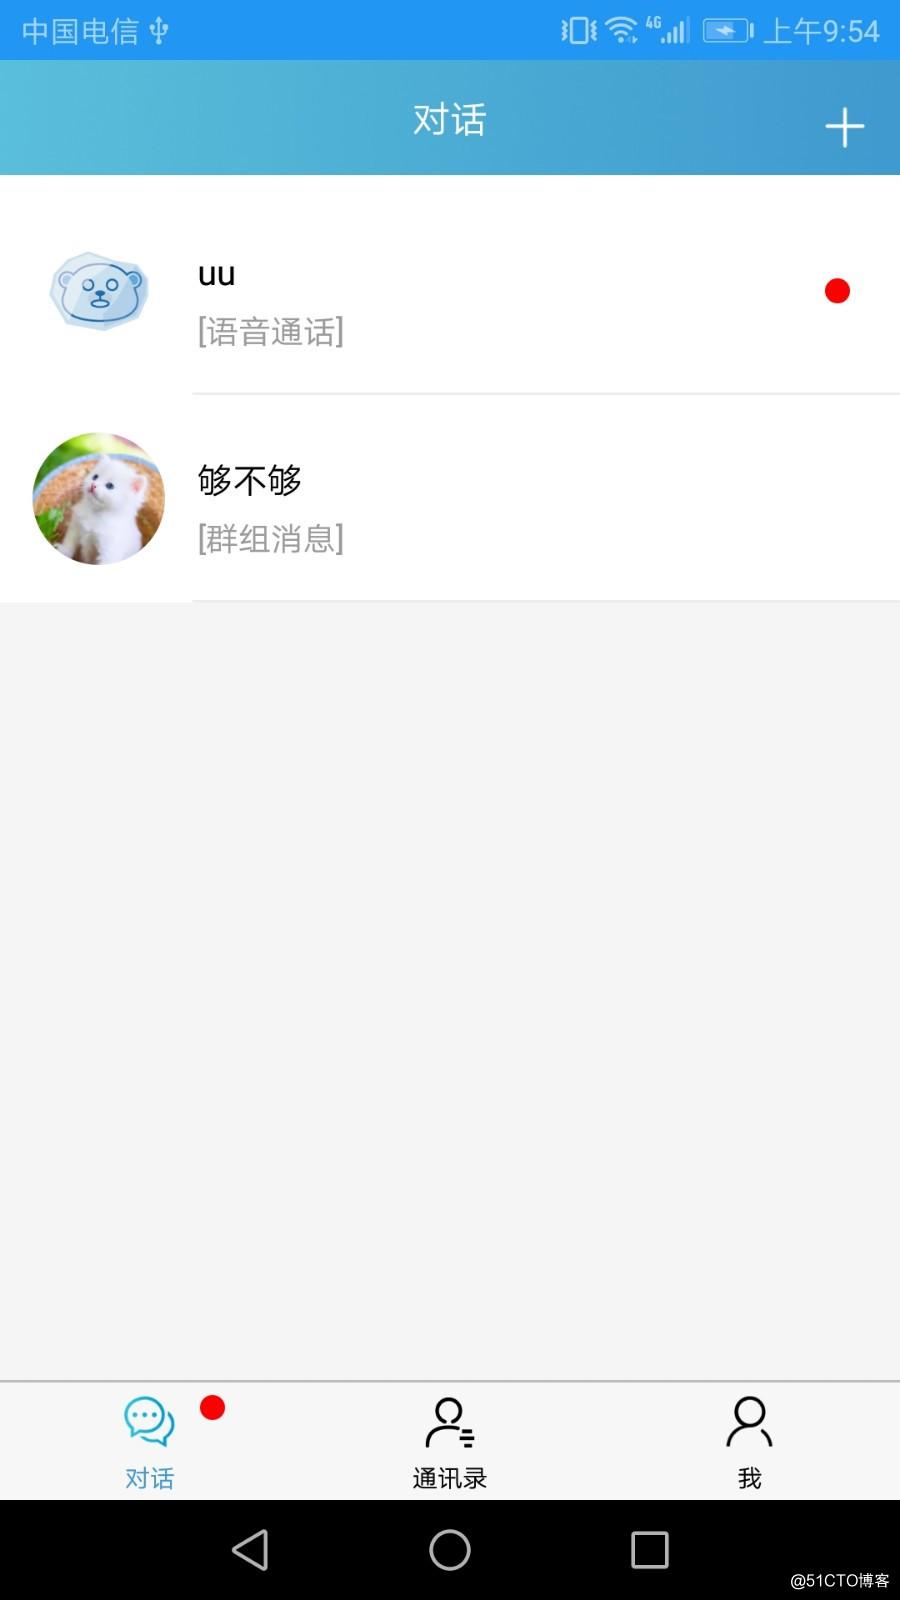 Android 极光IM-高级篇-玩聊天app诞生